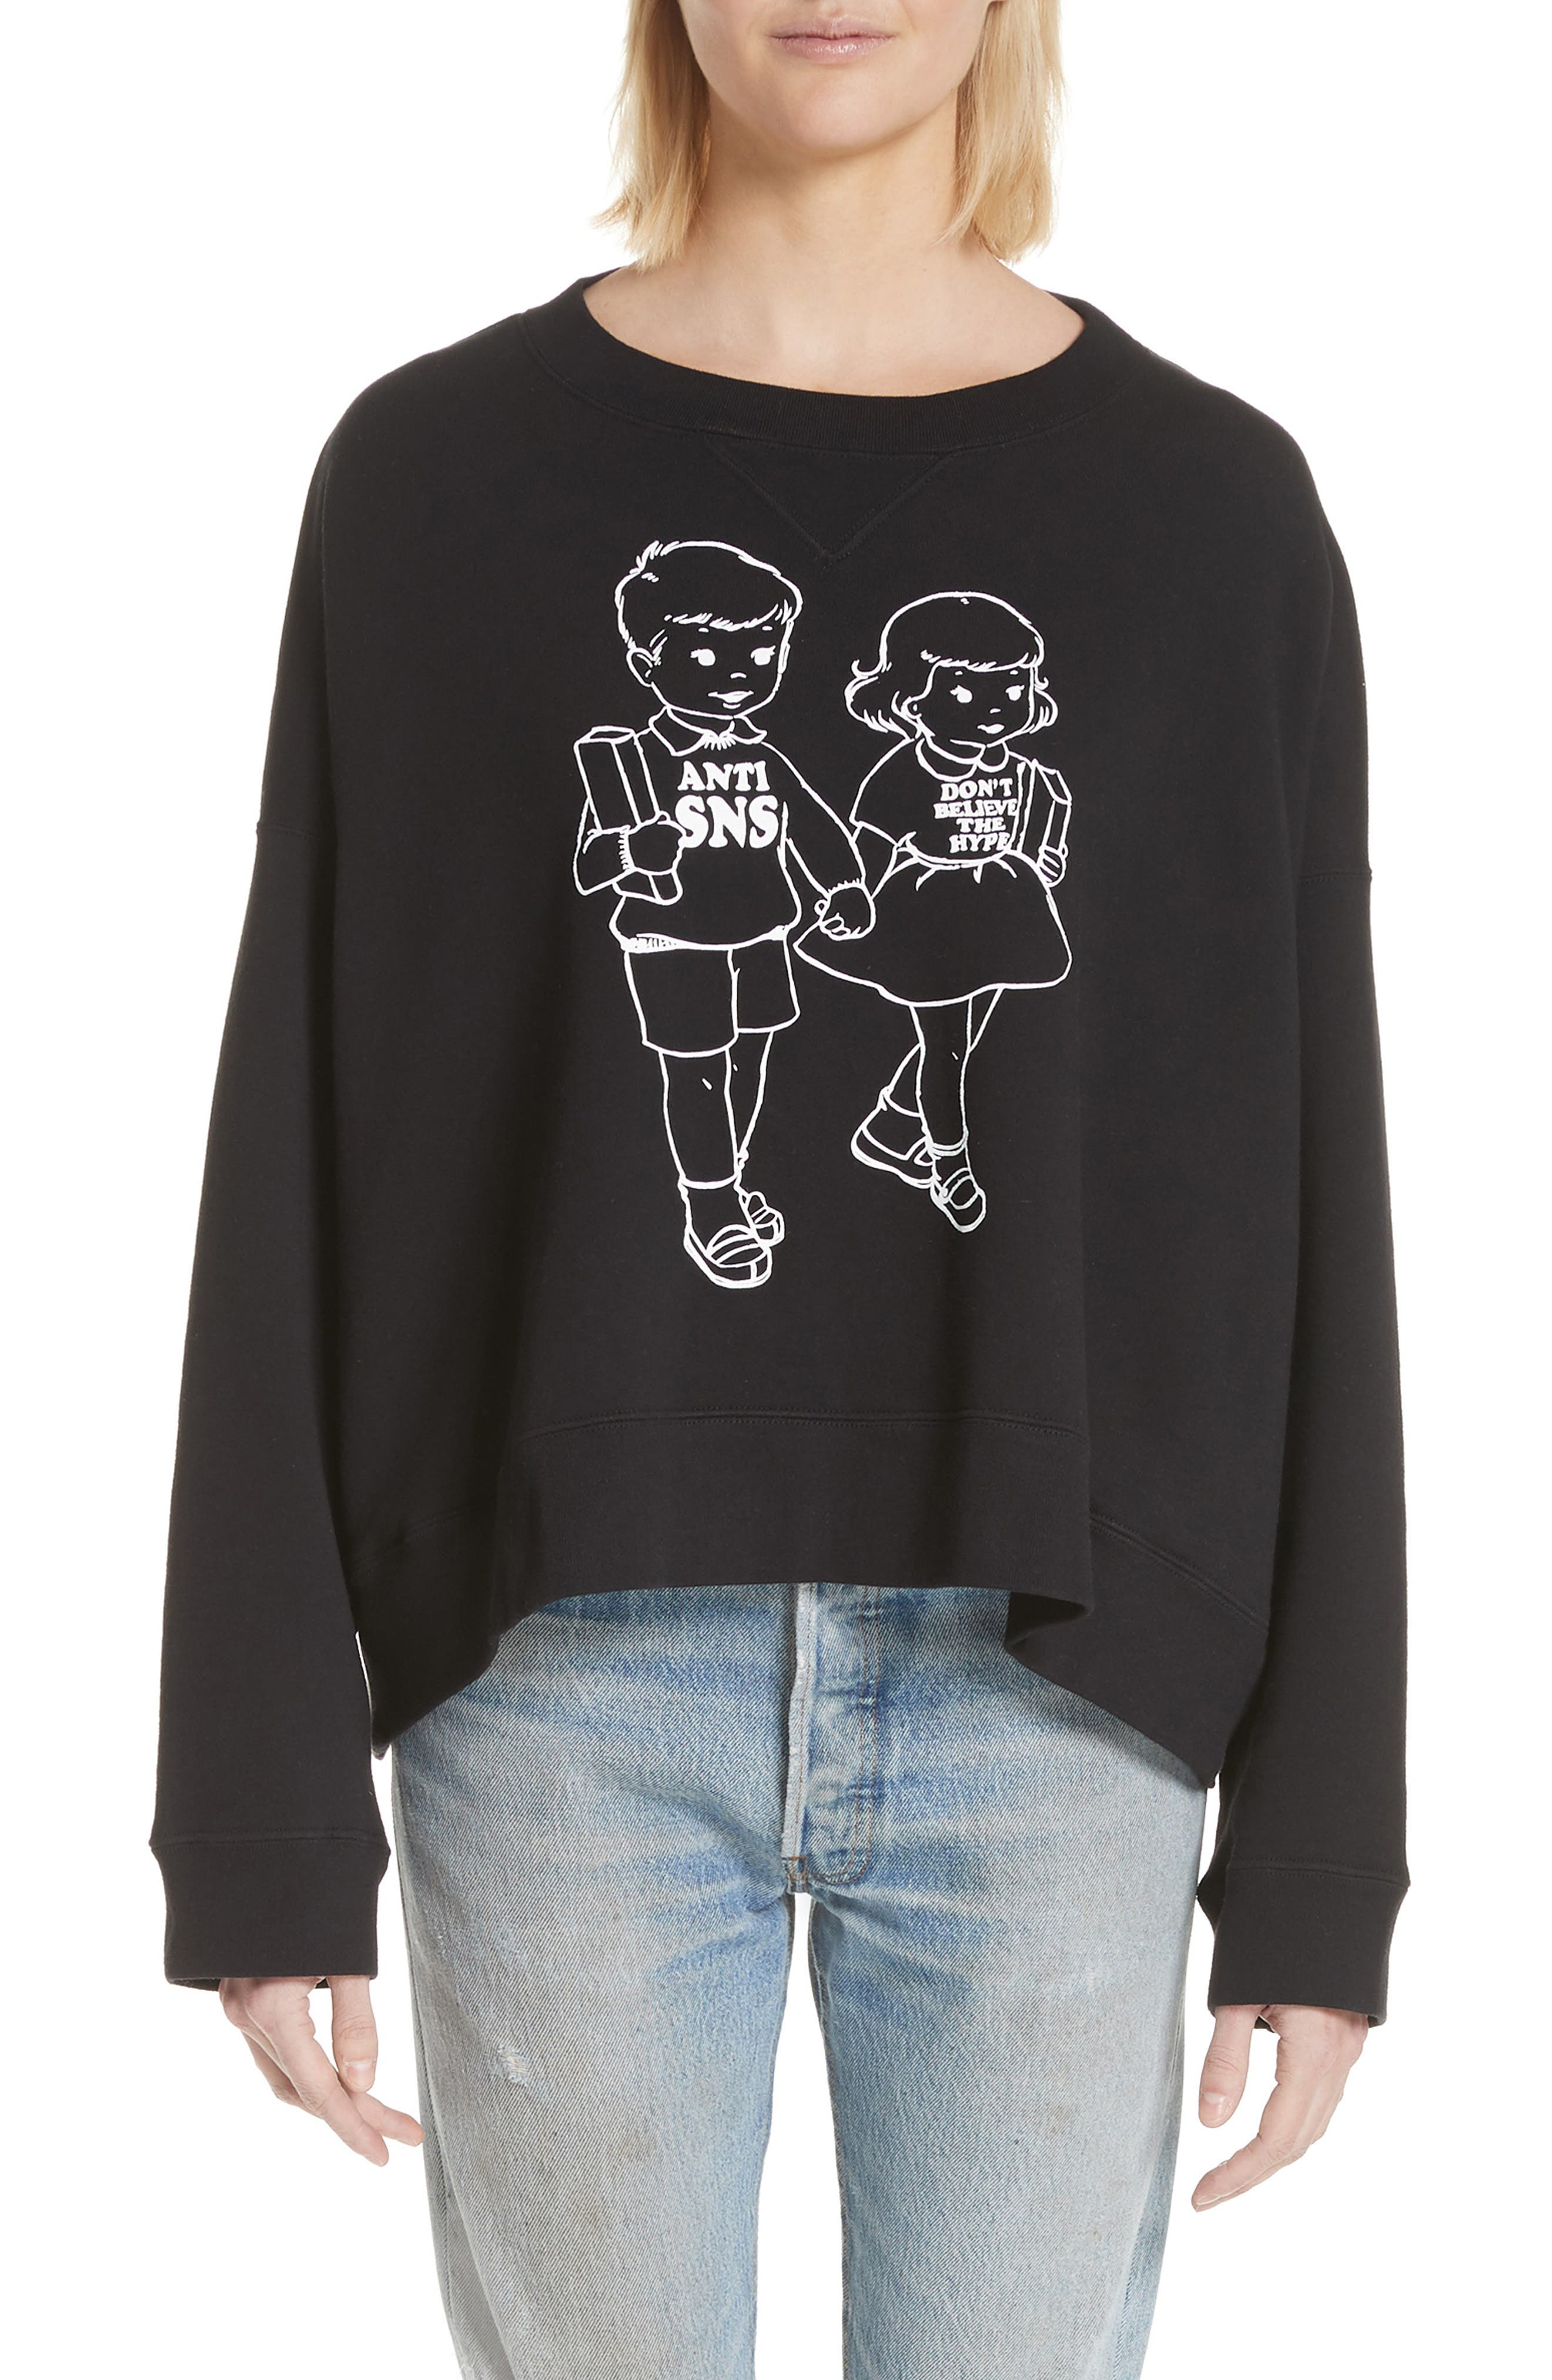 Undercover Anti SNS Graphic Sweatshirt